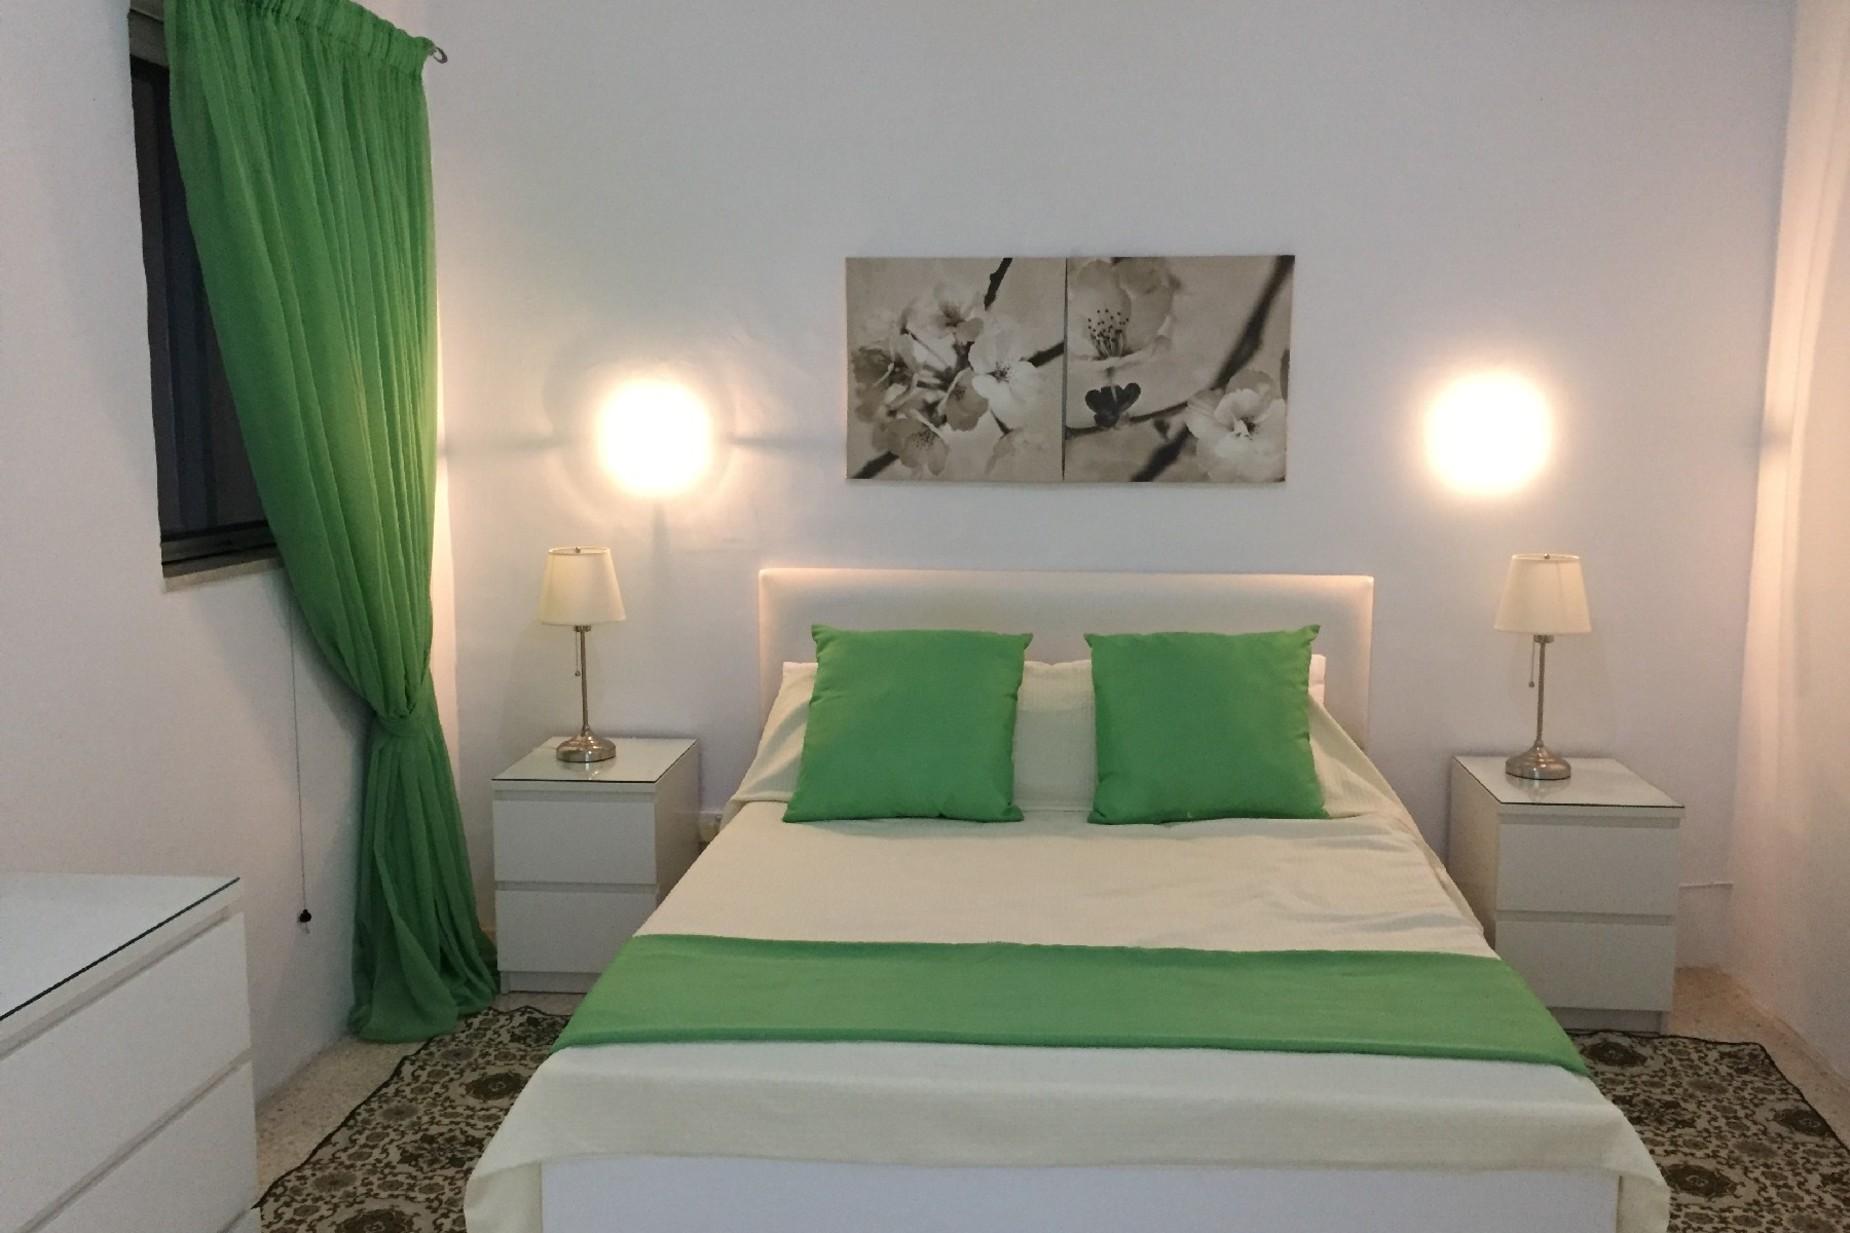 3 bed Apartment For Rent in Sliema, Sliema - thumb 8